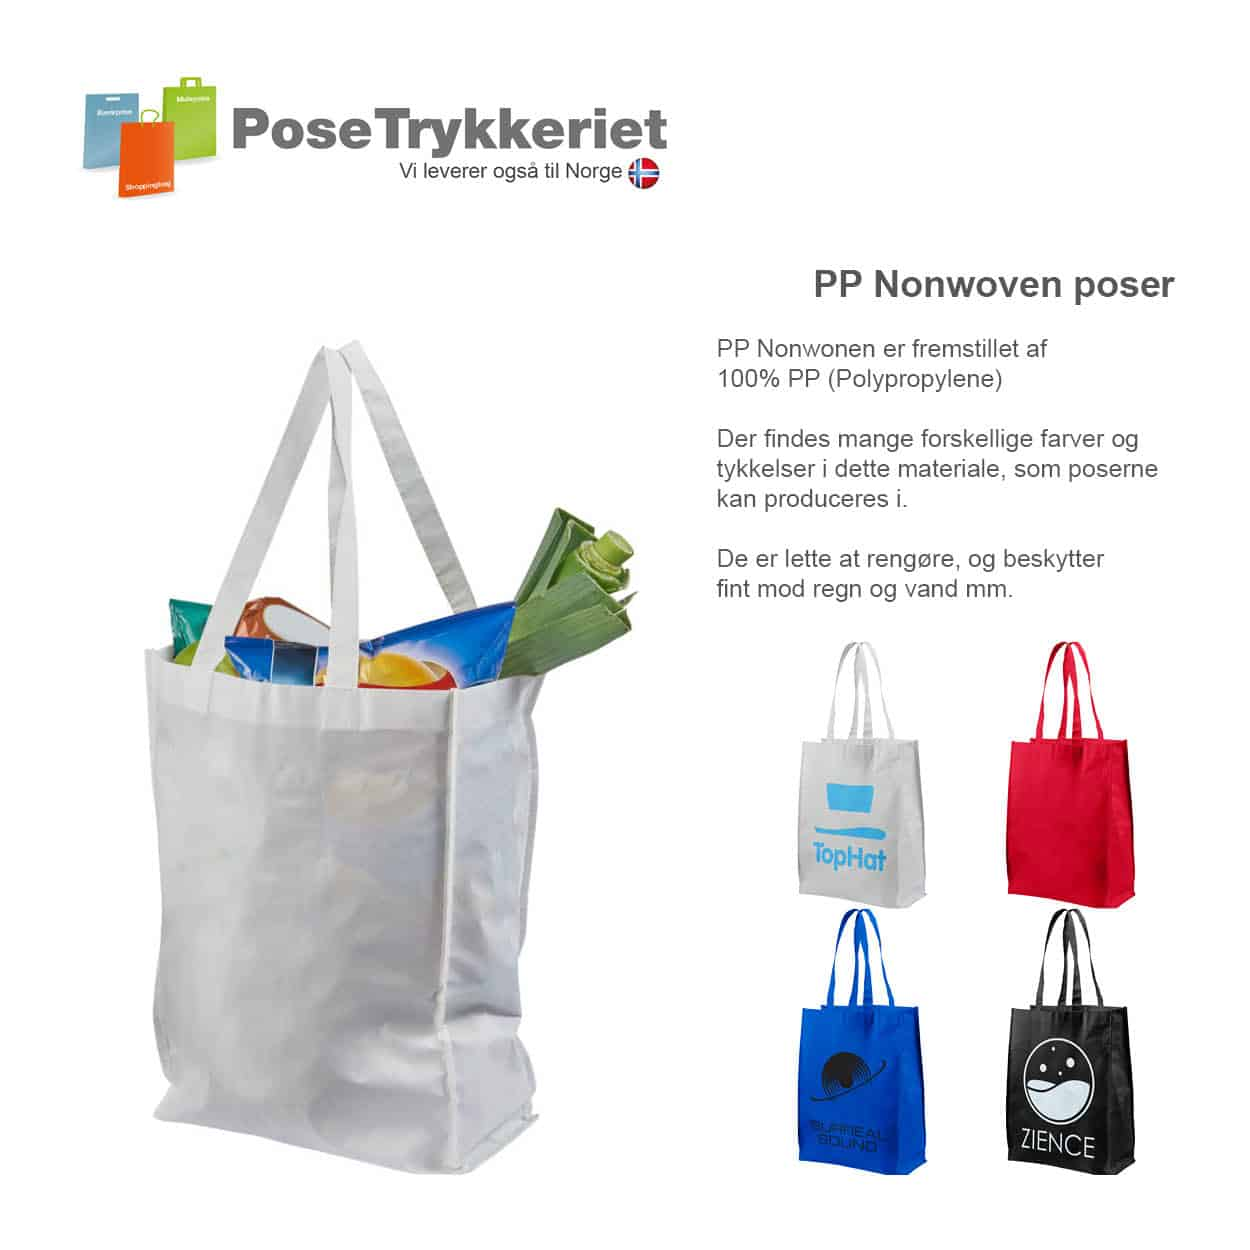 Laminerede Nonwoven poser med logotryk. PoseTrykkeriet.dk